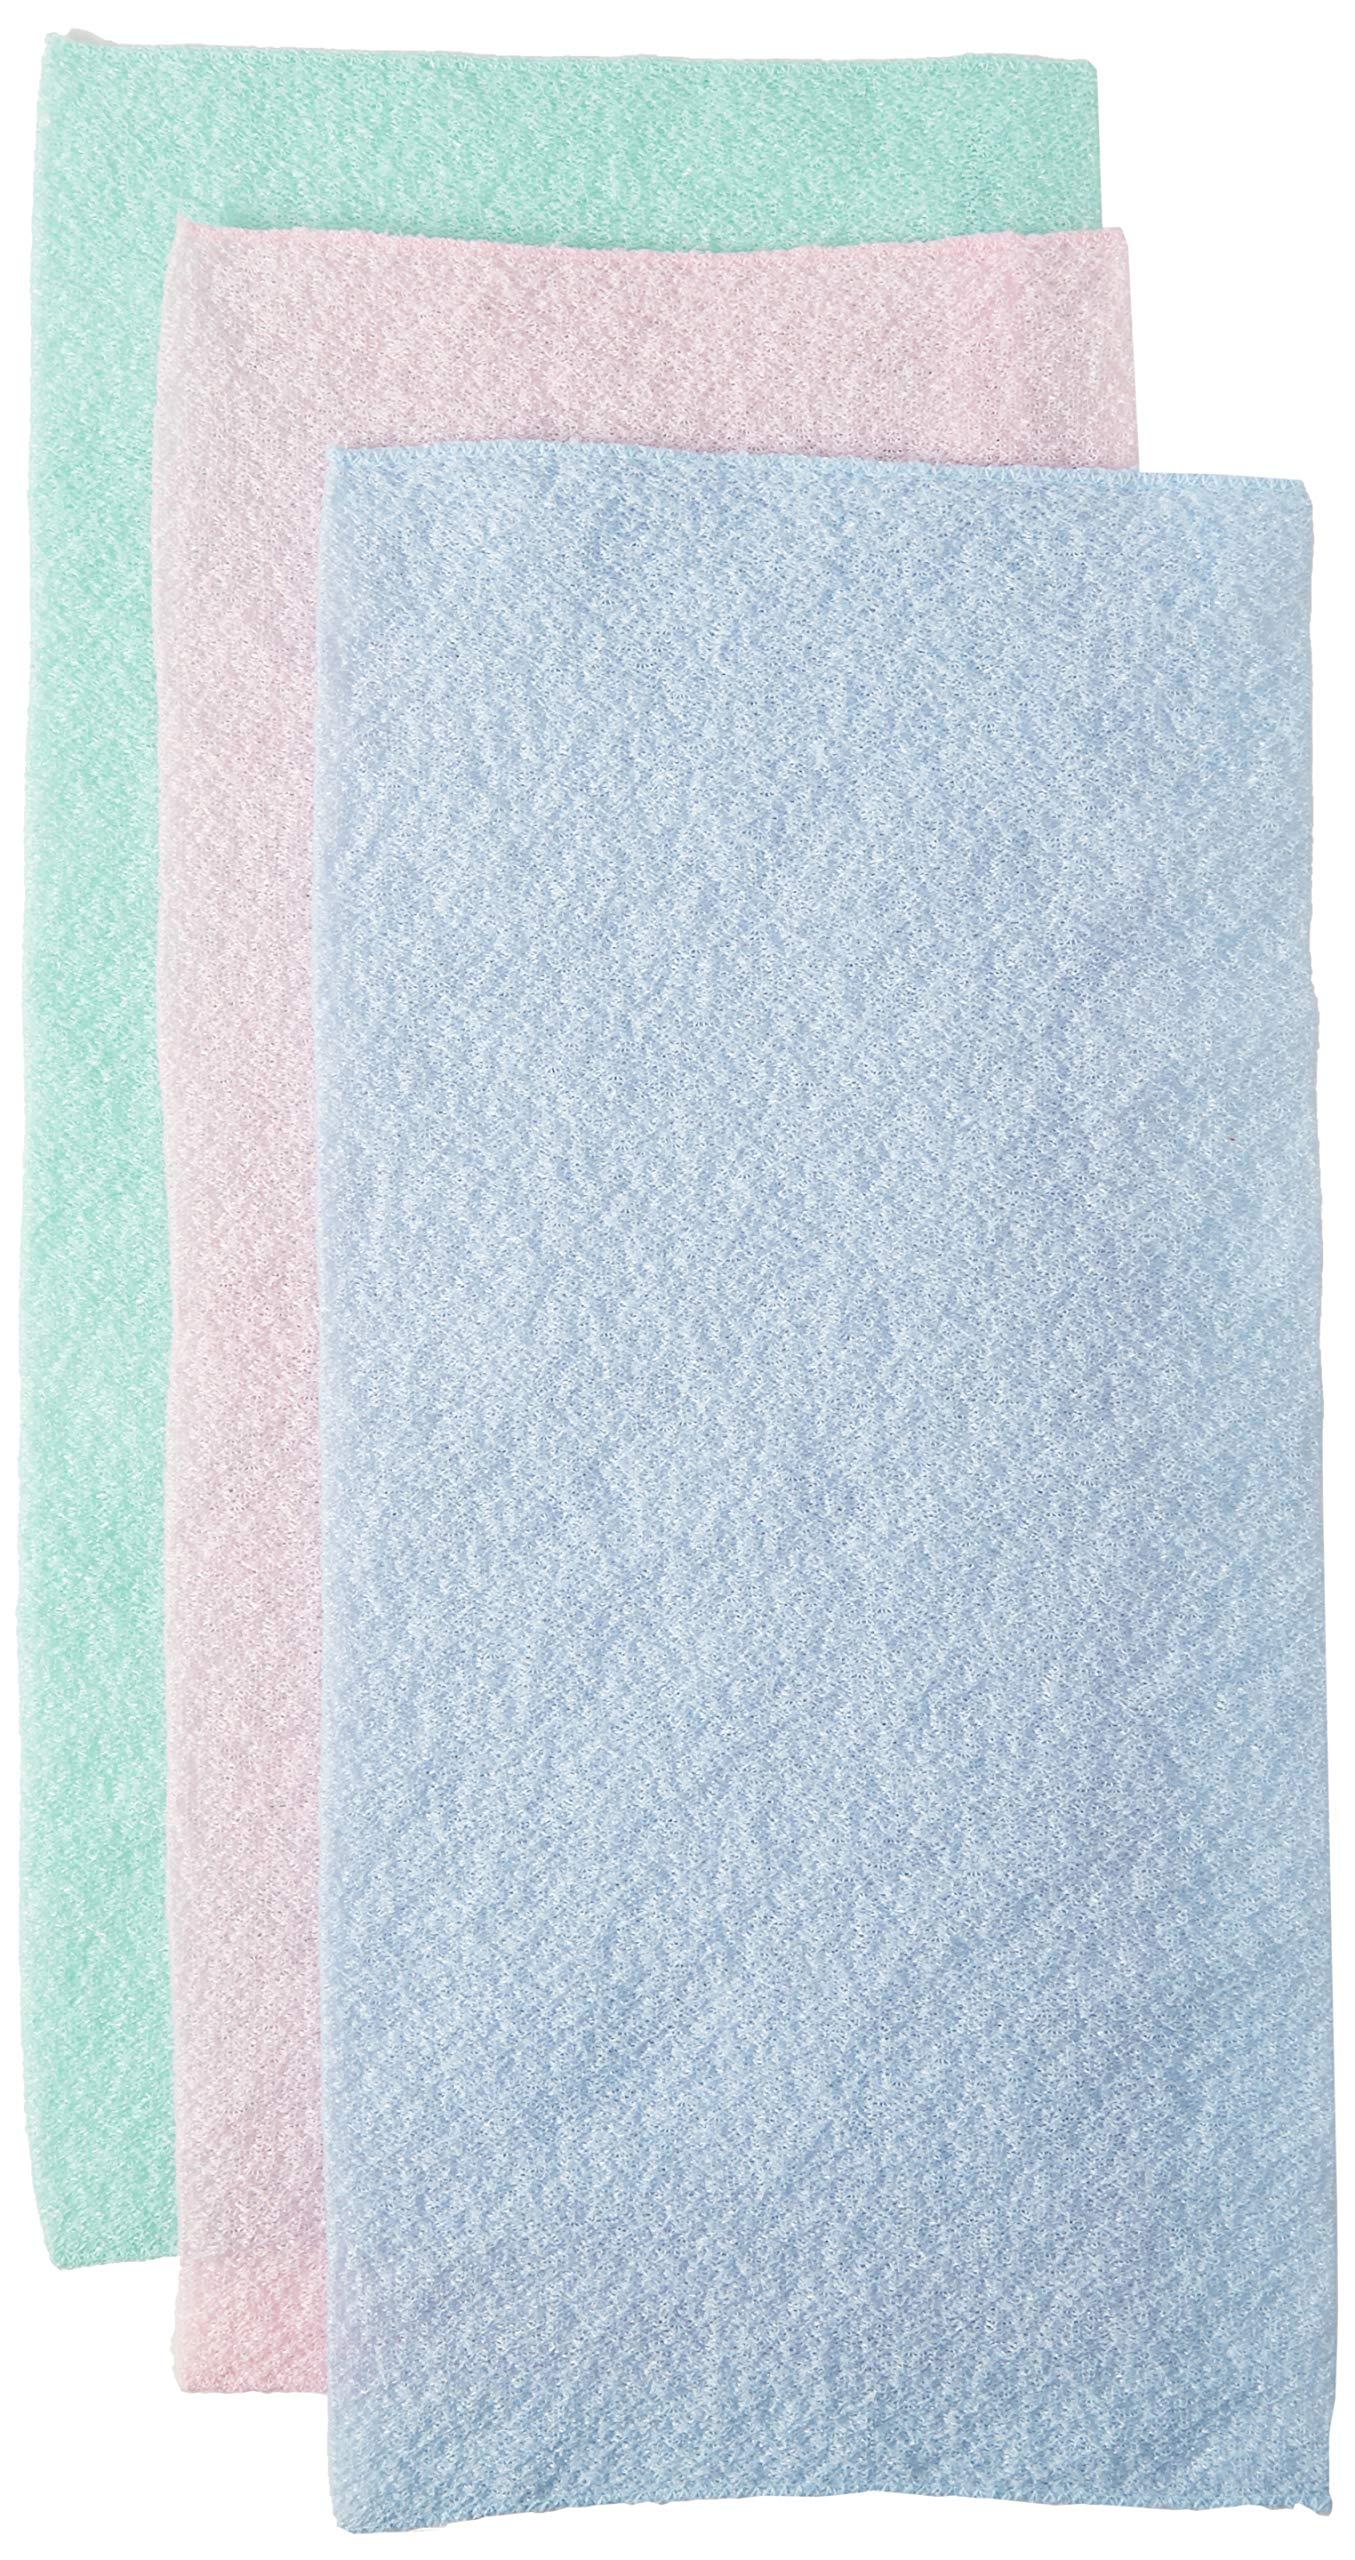 Clean Logic Stretch Bath & Shower Cloth (Assorted Colors) (6 Pack)